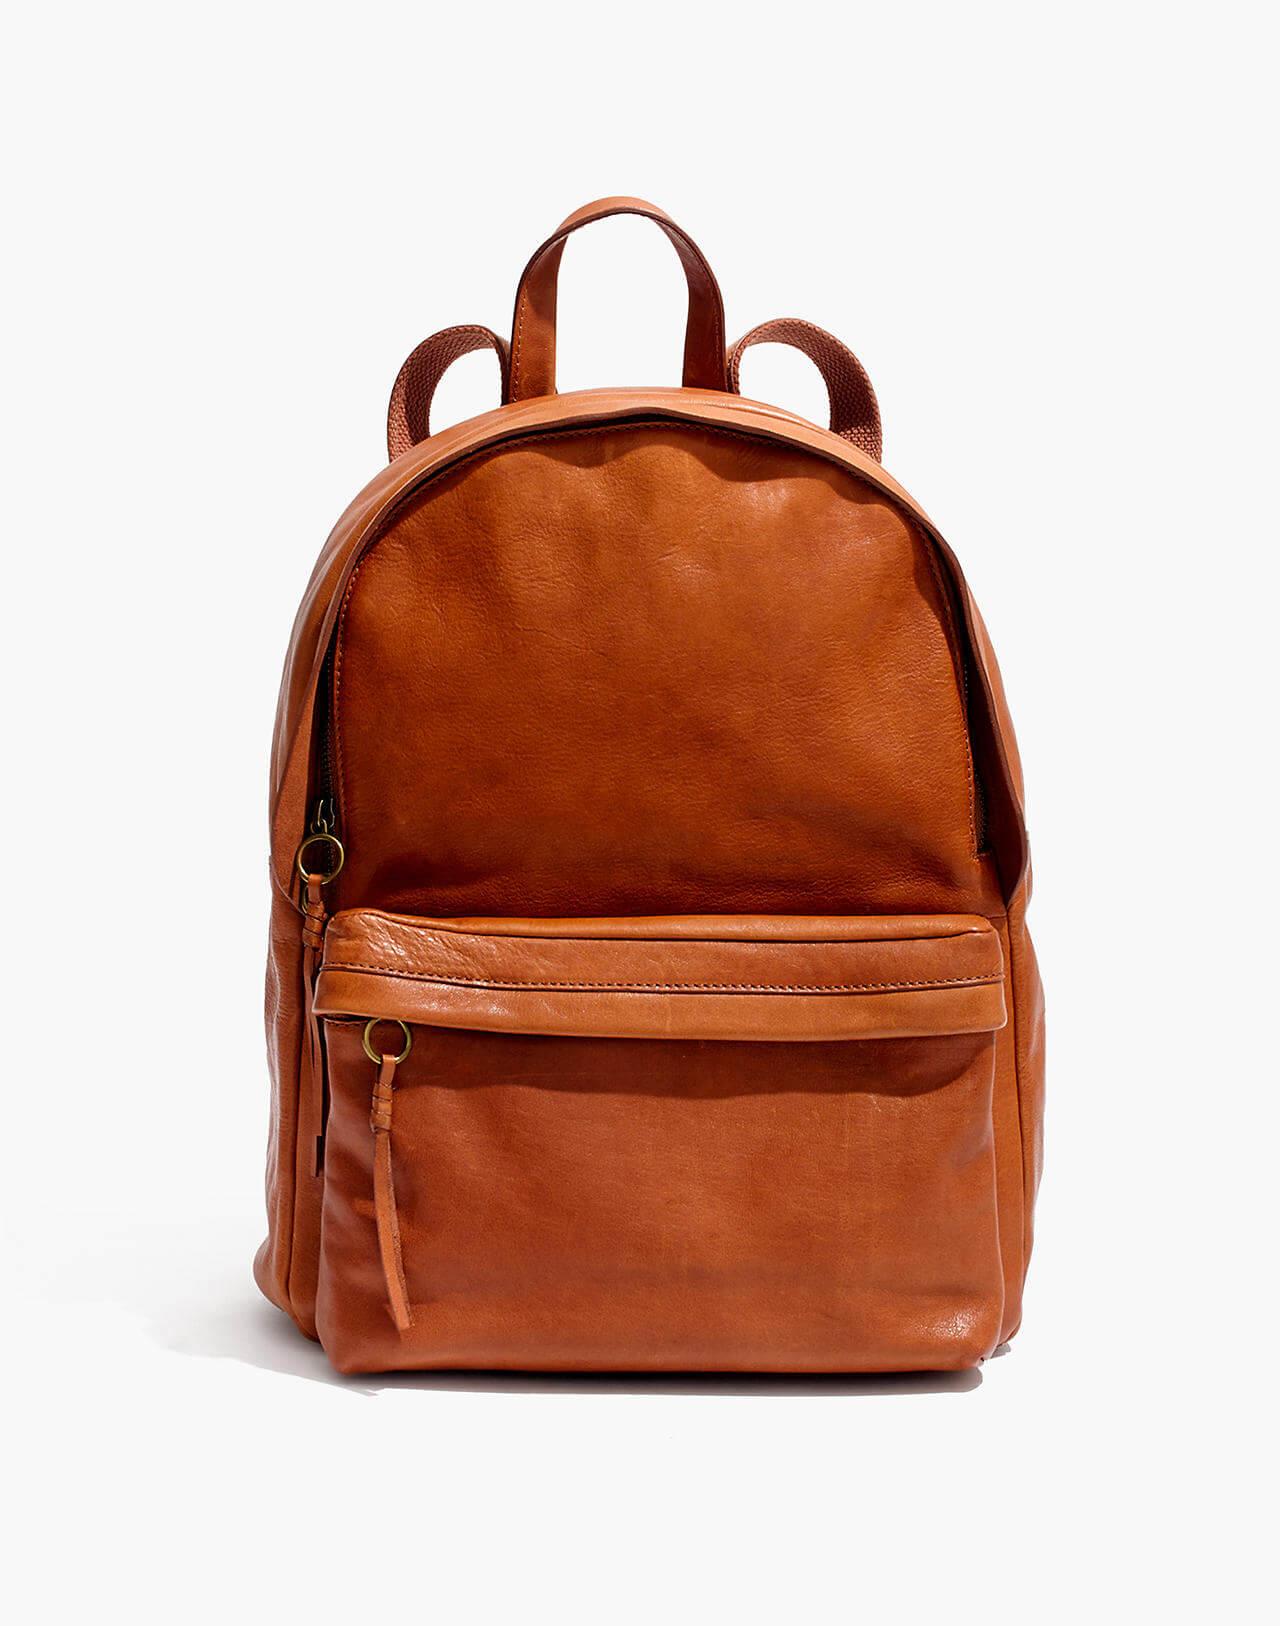 ba3b9d17af50 17 Best Women's Backpacks for Work | Fairygodboss